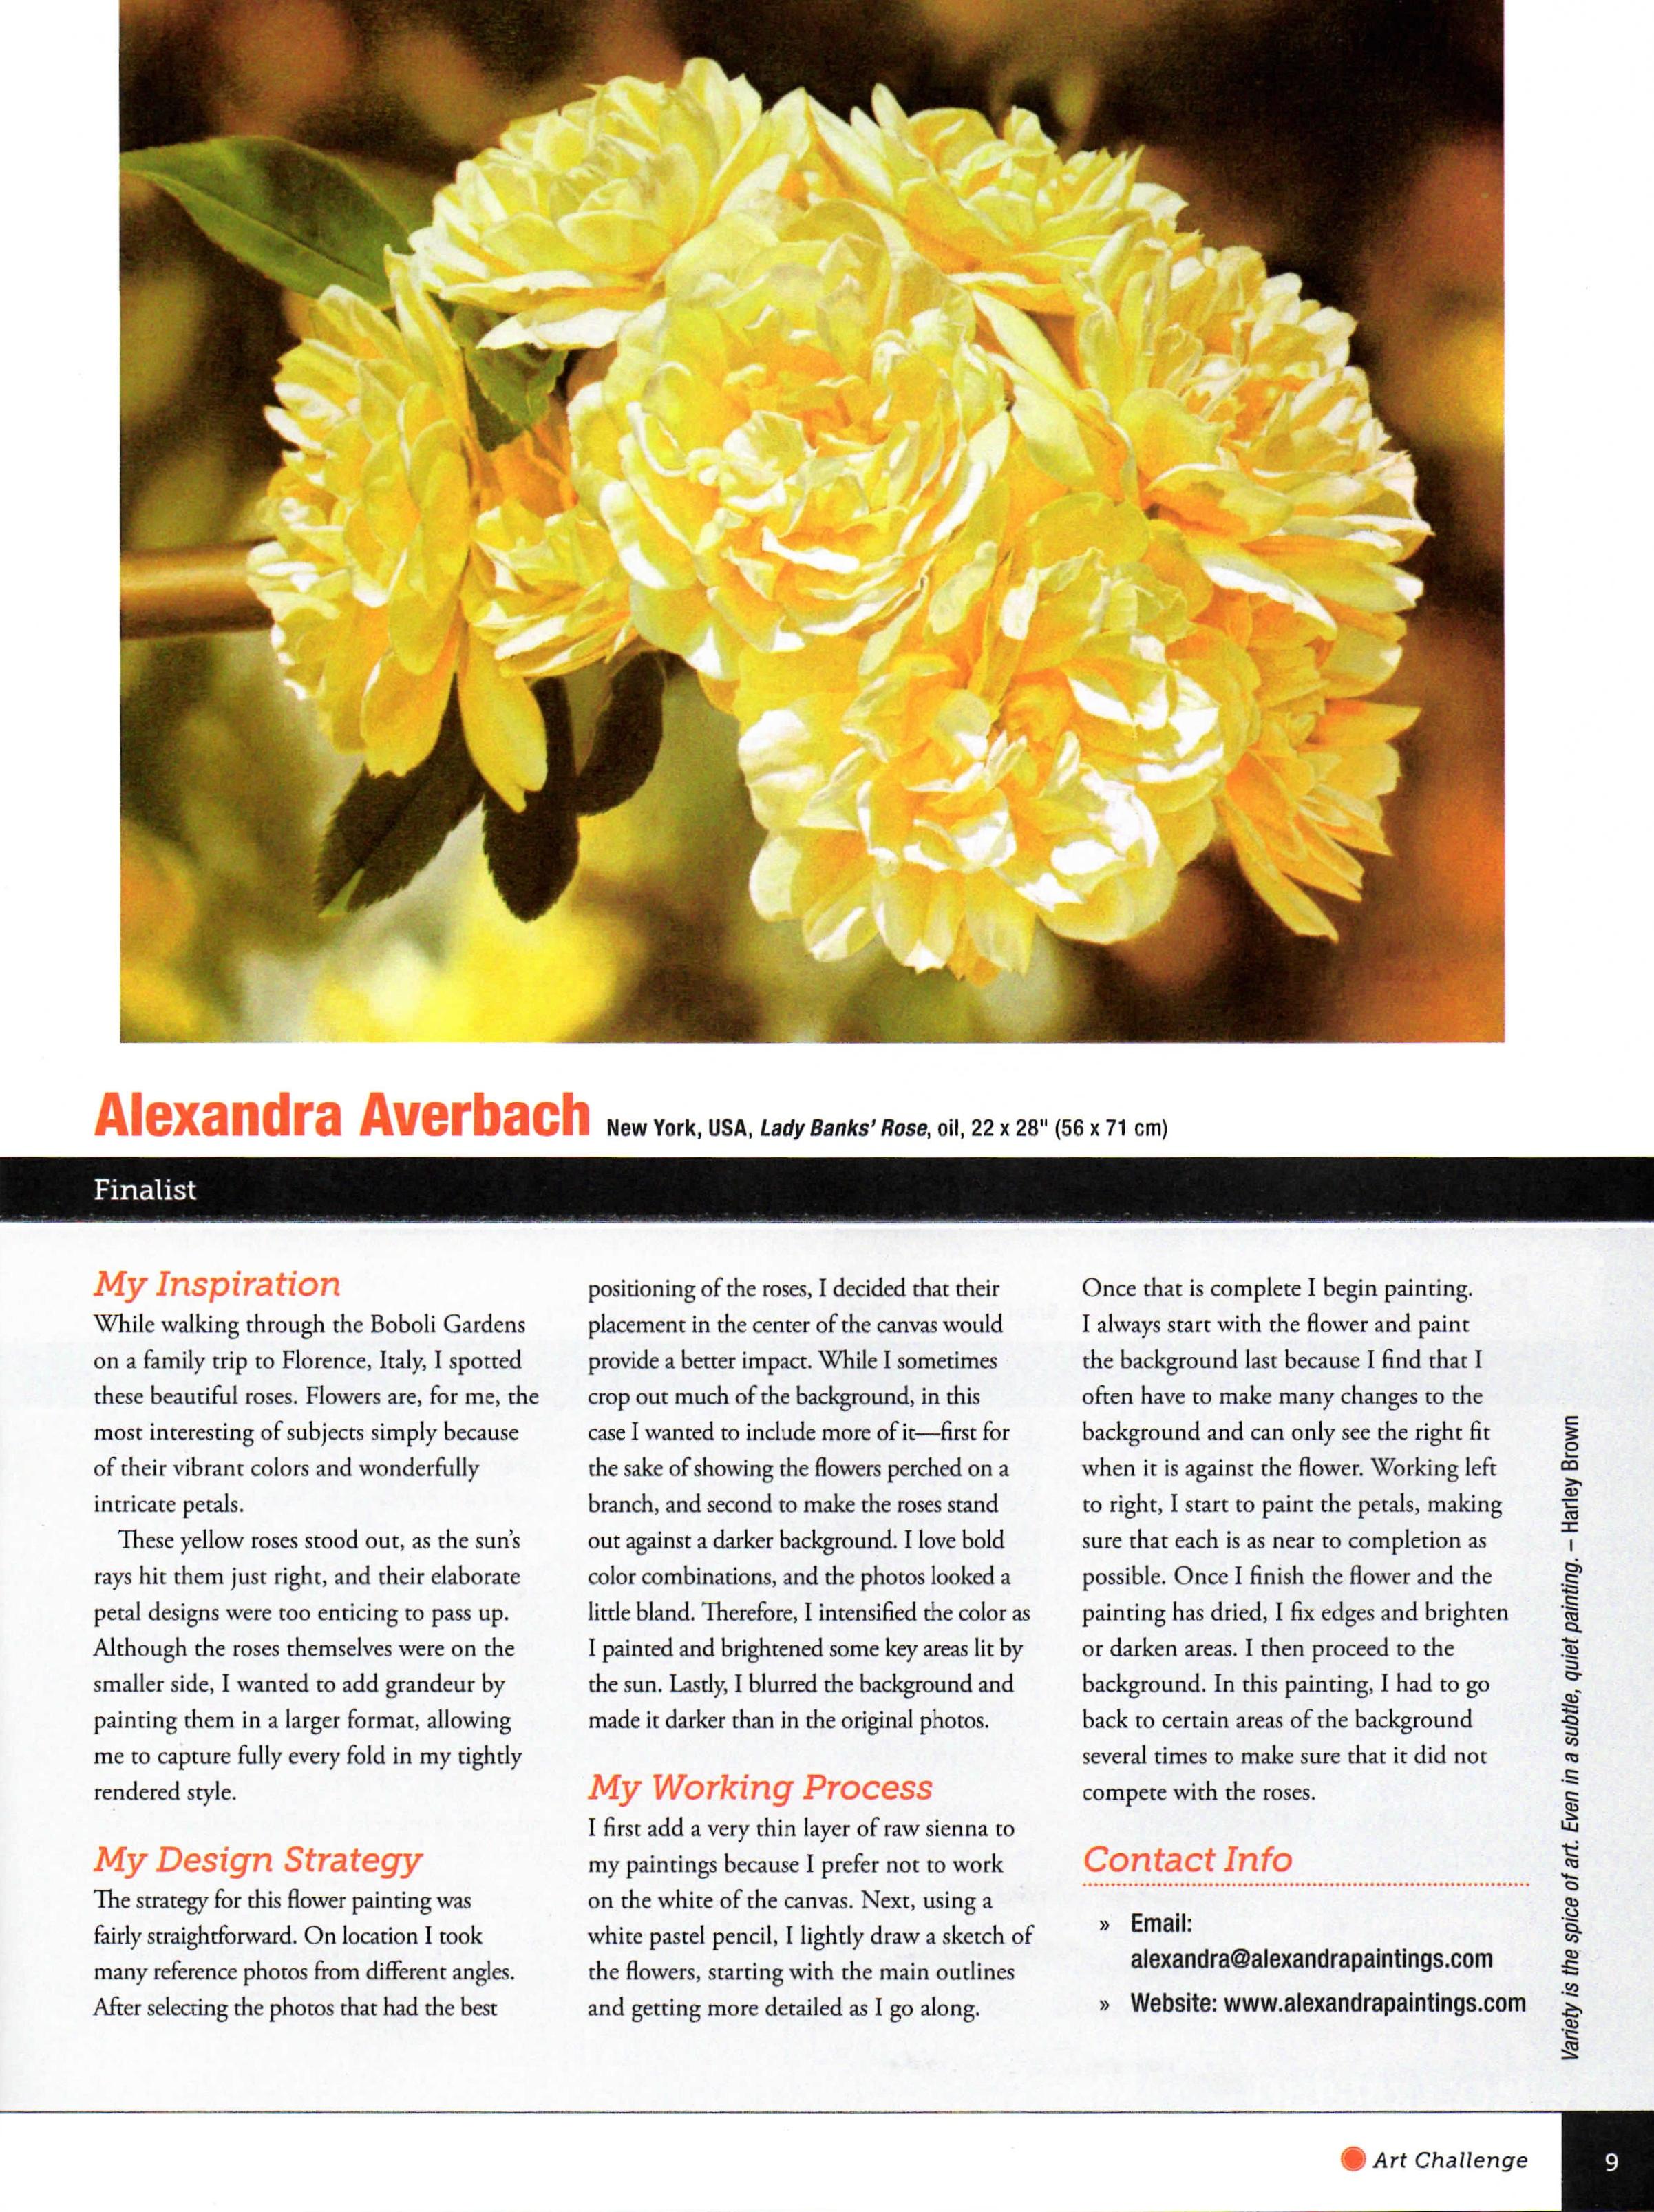 02 International Artist Florals & Gardens #77.jpg